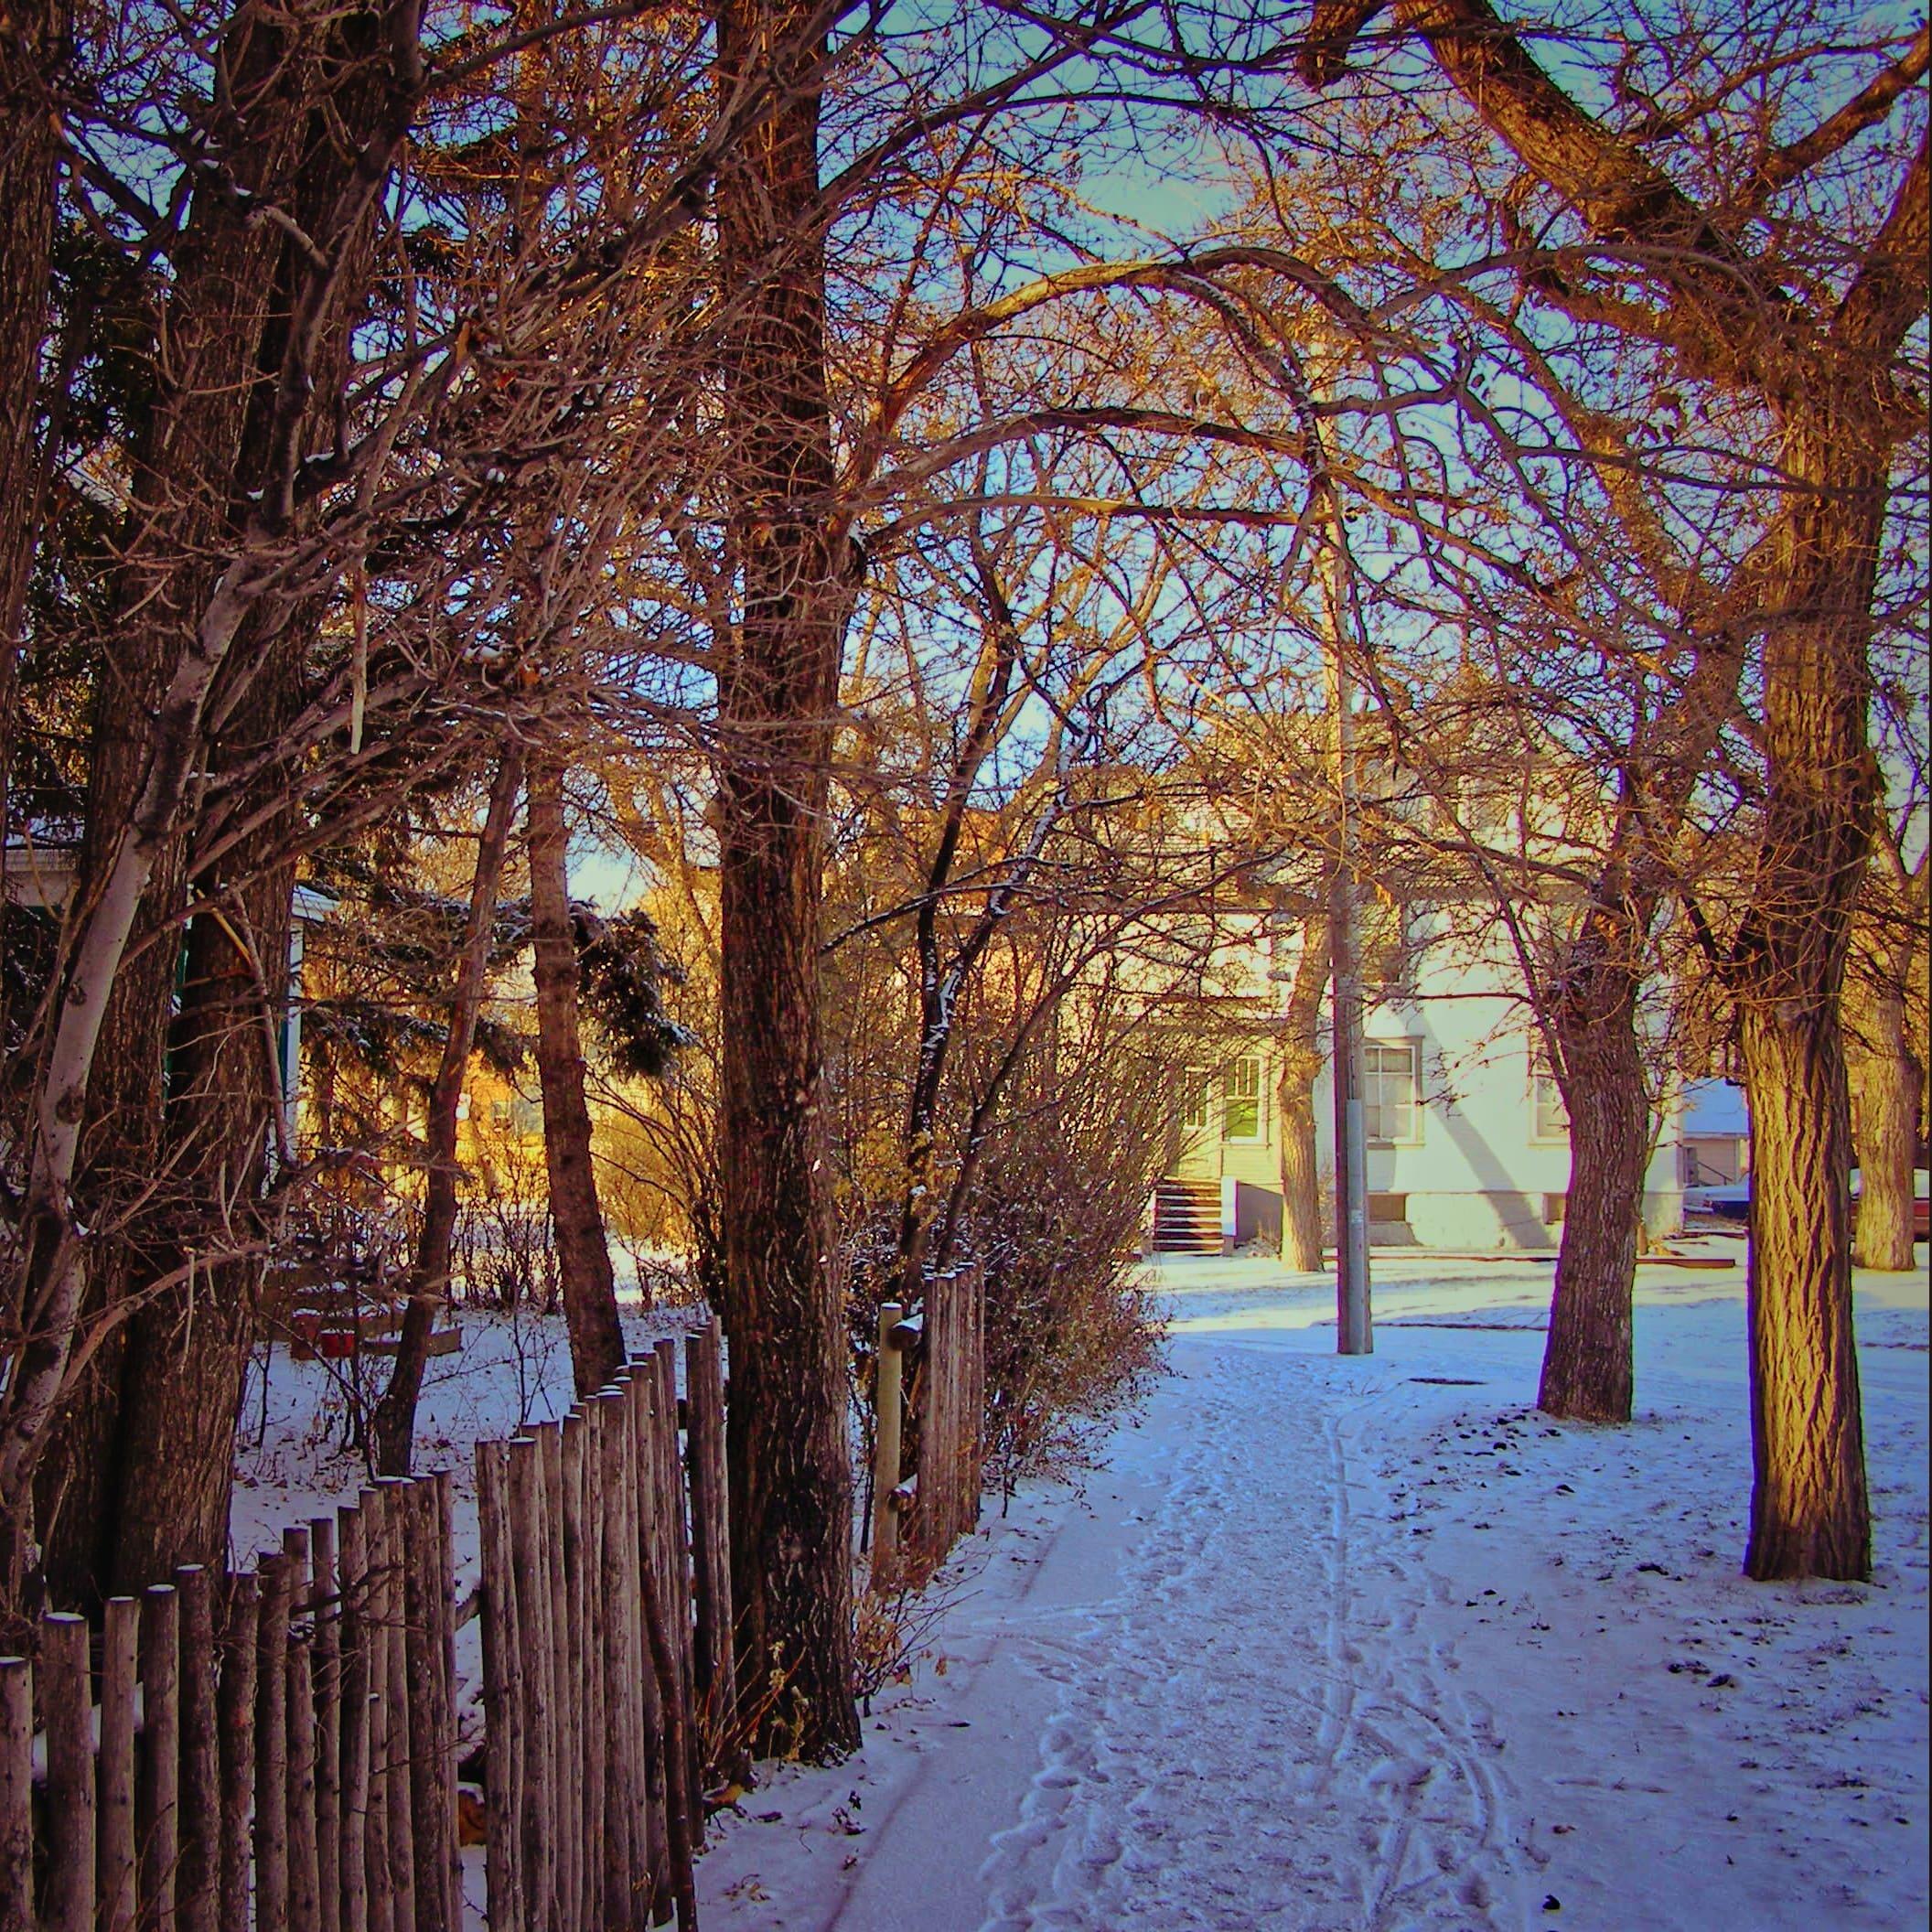 Morning Walks to Tim Hortons, Winnipeg [2006]